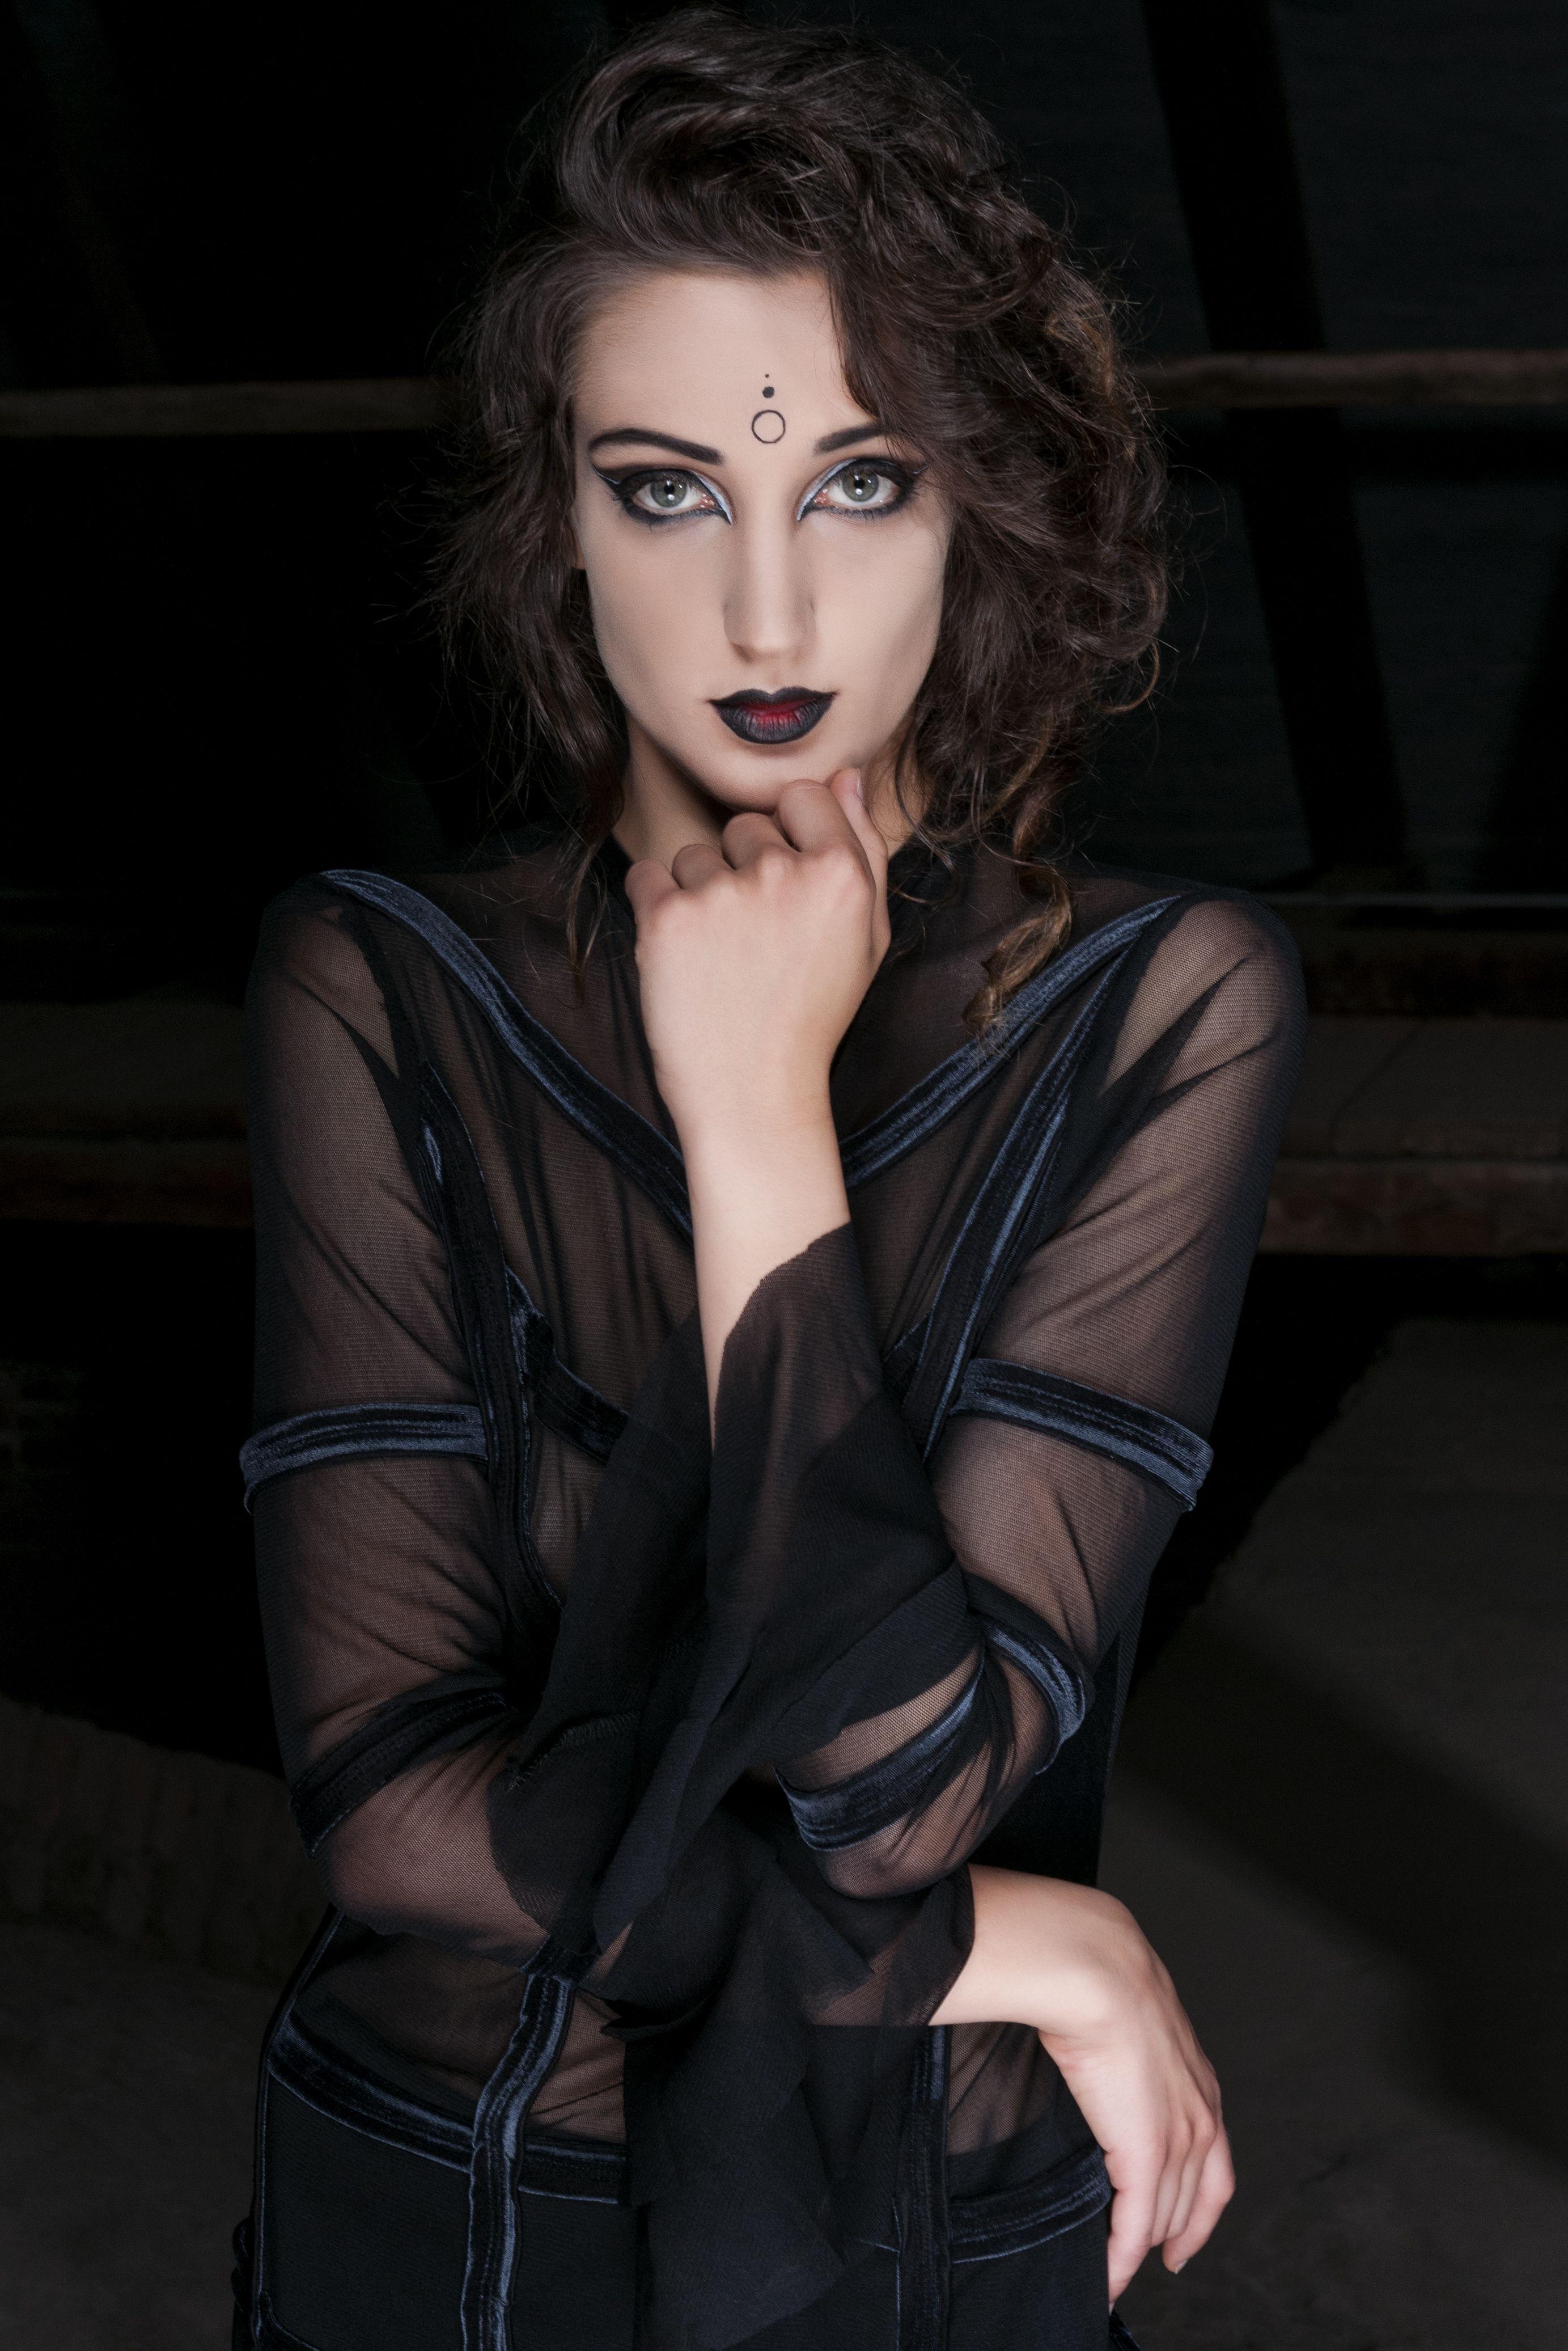 Sedinta foto vestimentatii gotice cu model